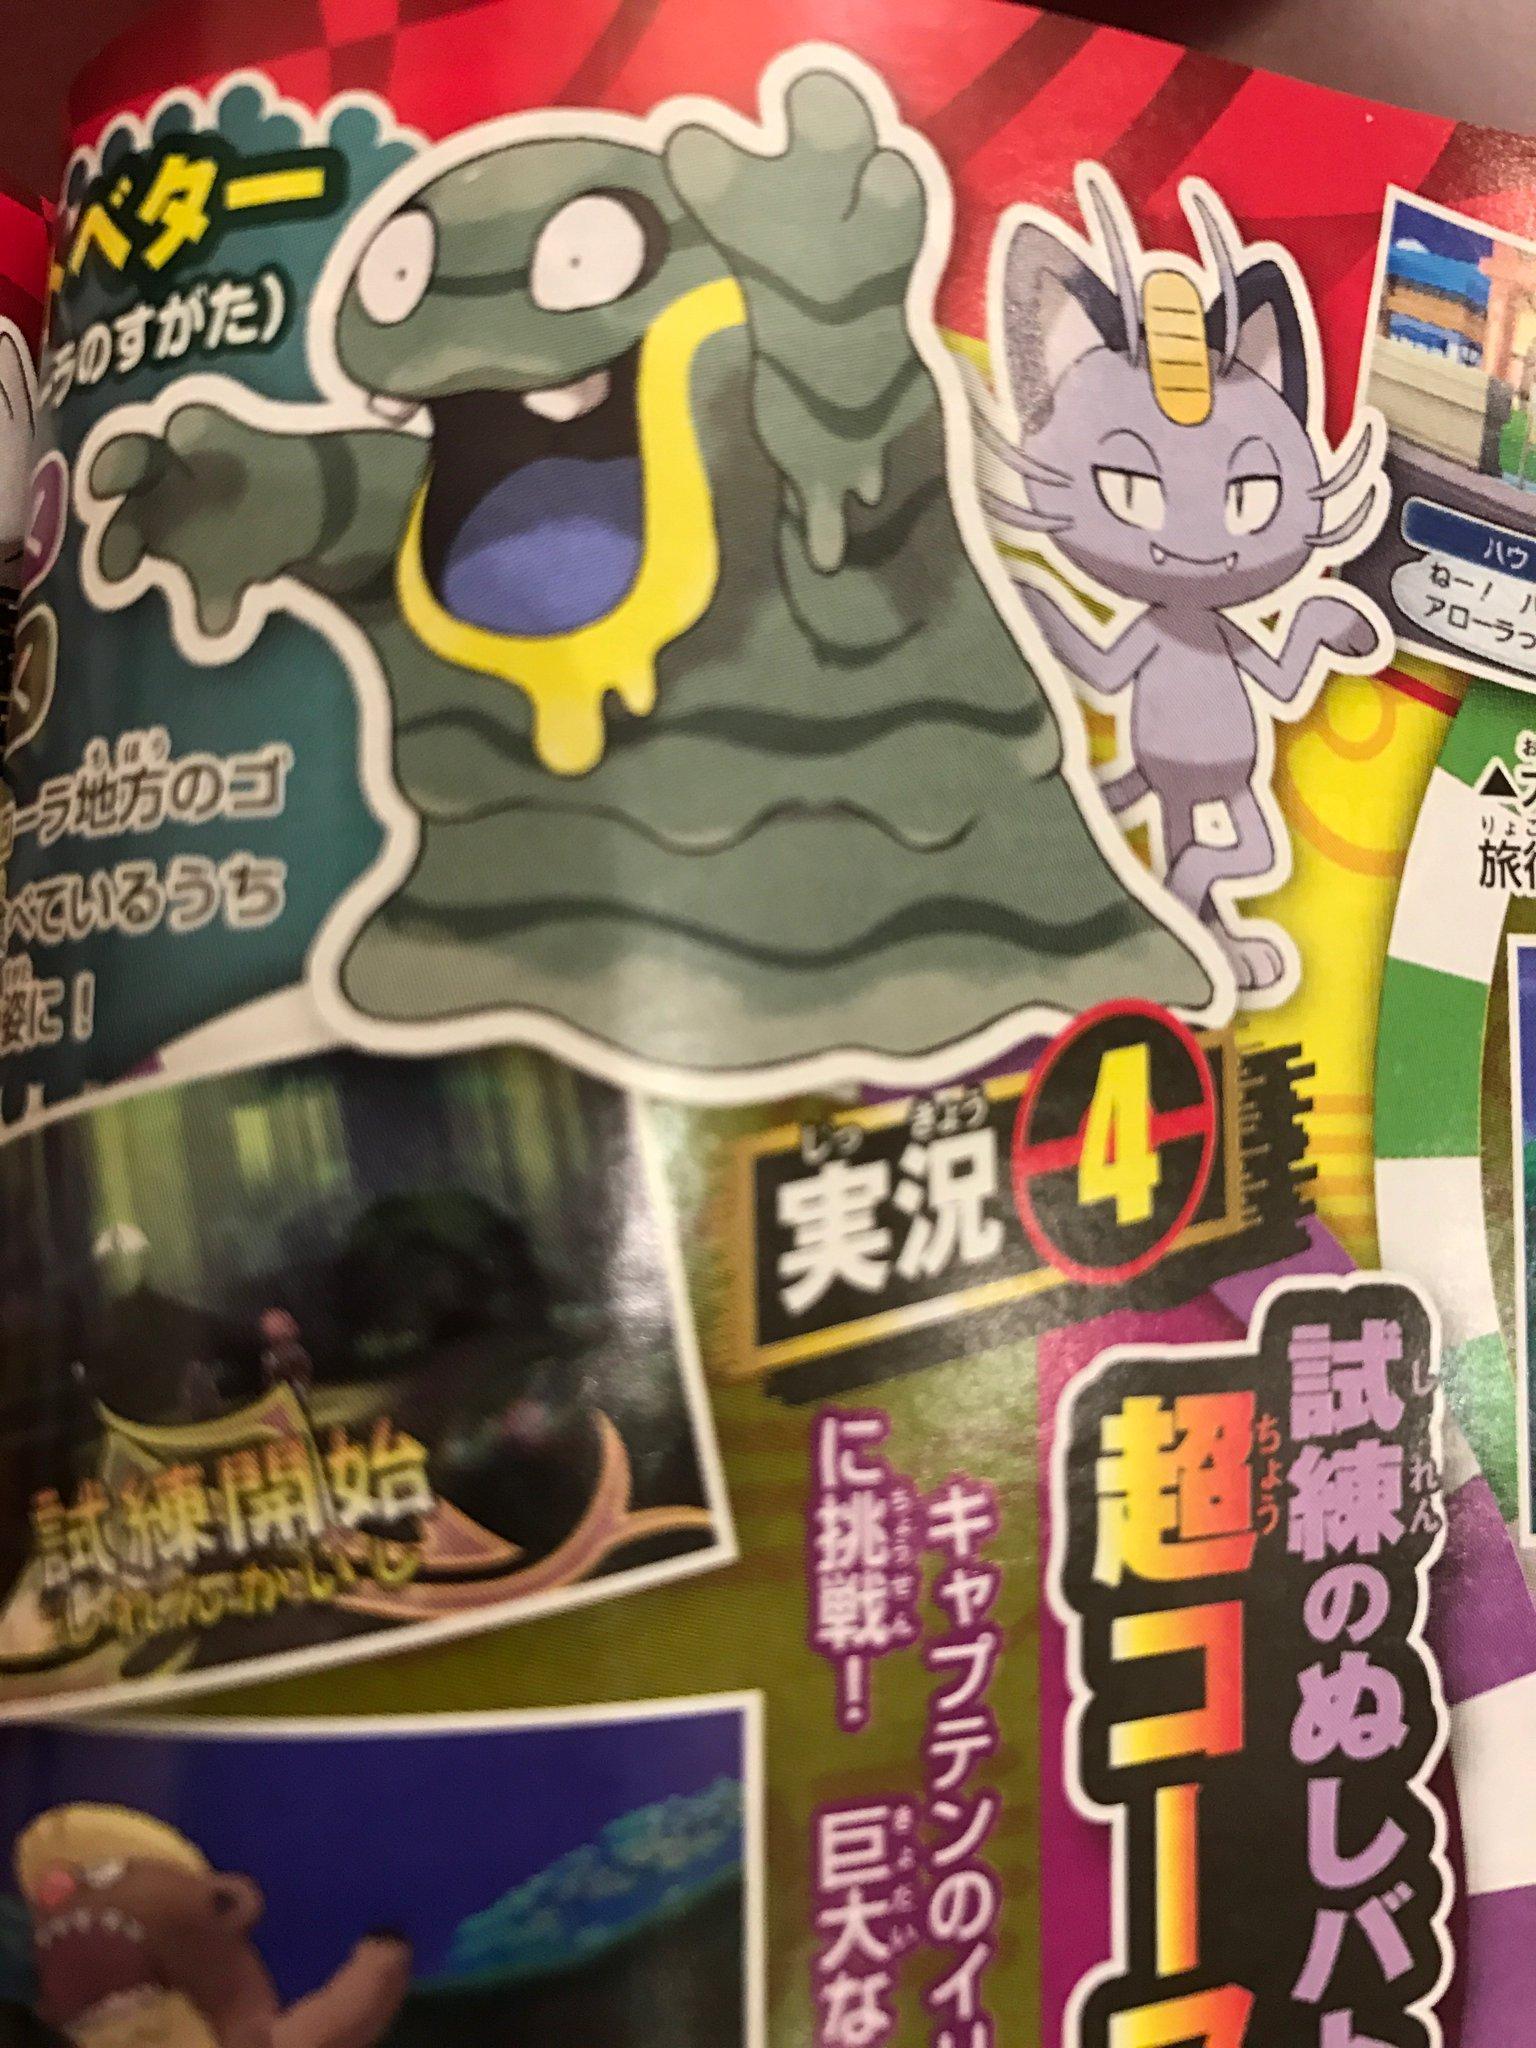 PokemonSoleil 3DS Div 018